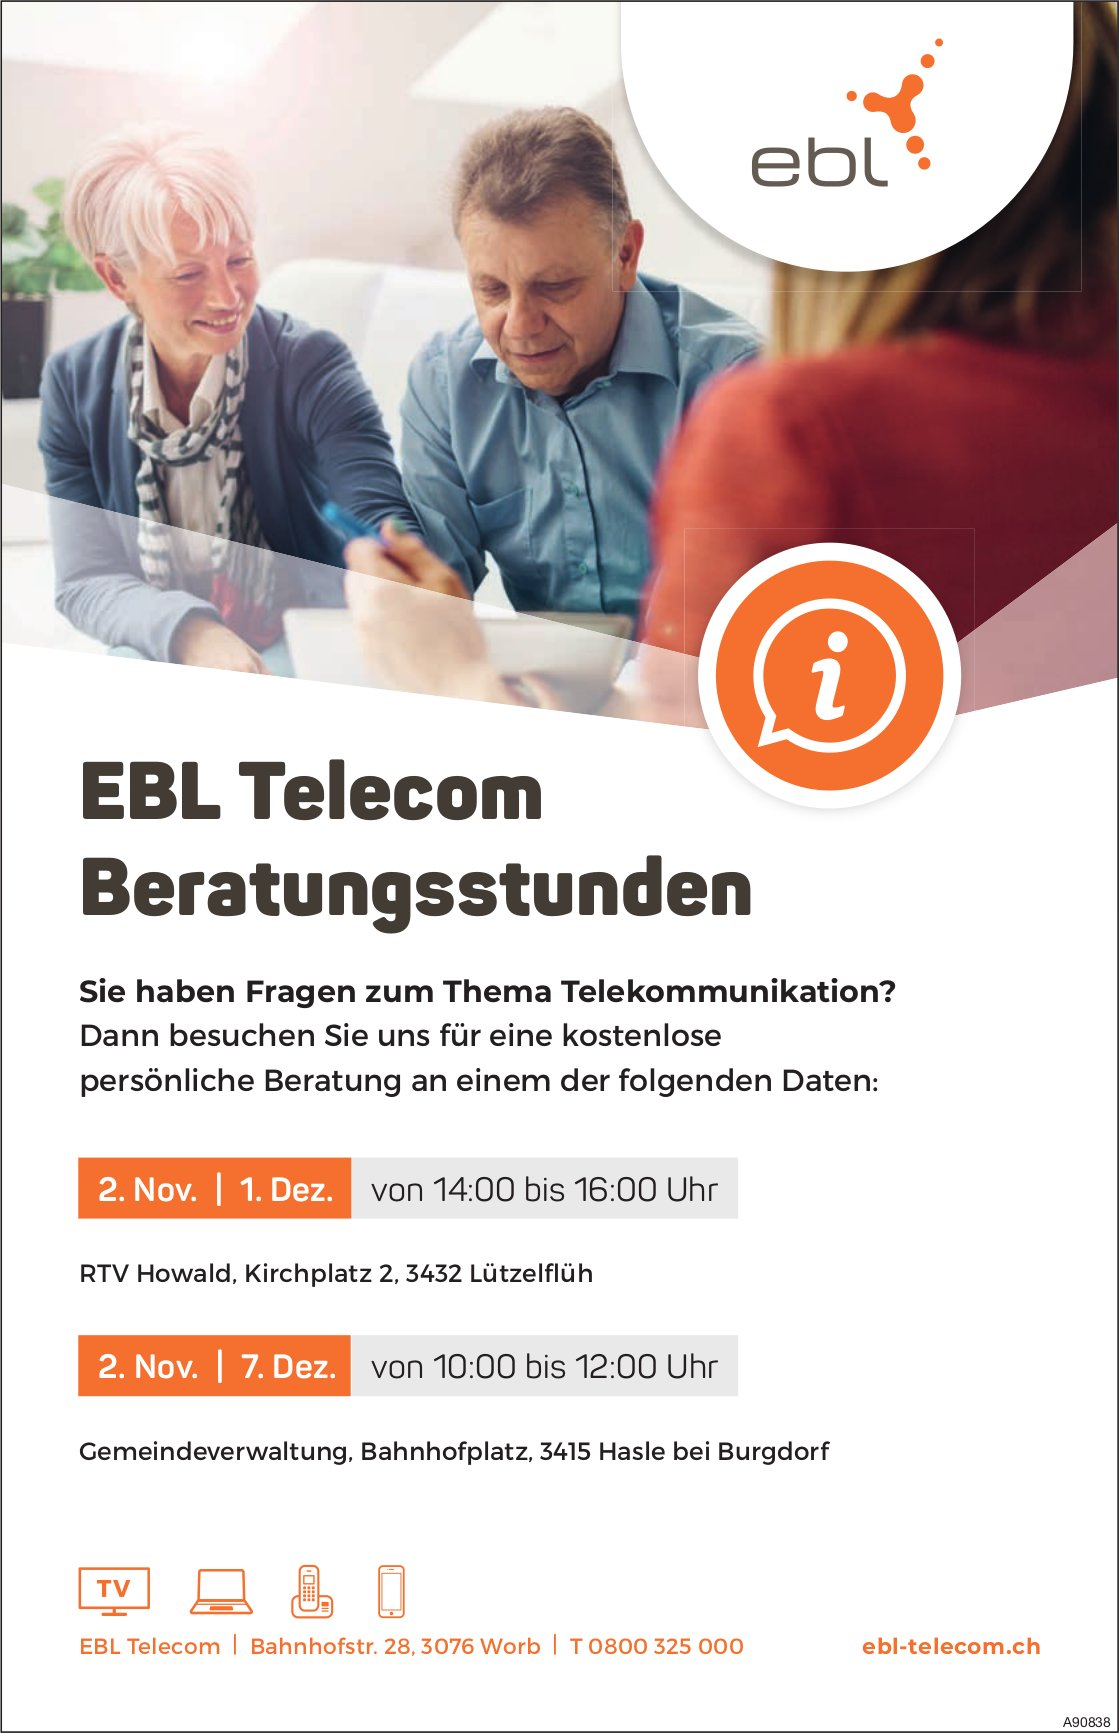 EBL Telecom Beratungsstunden, 7. Dezember, Hasle b. Burgdorf